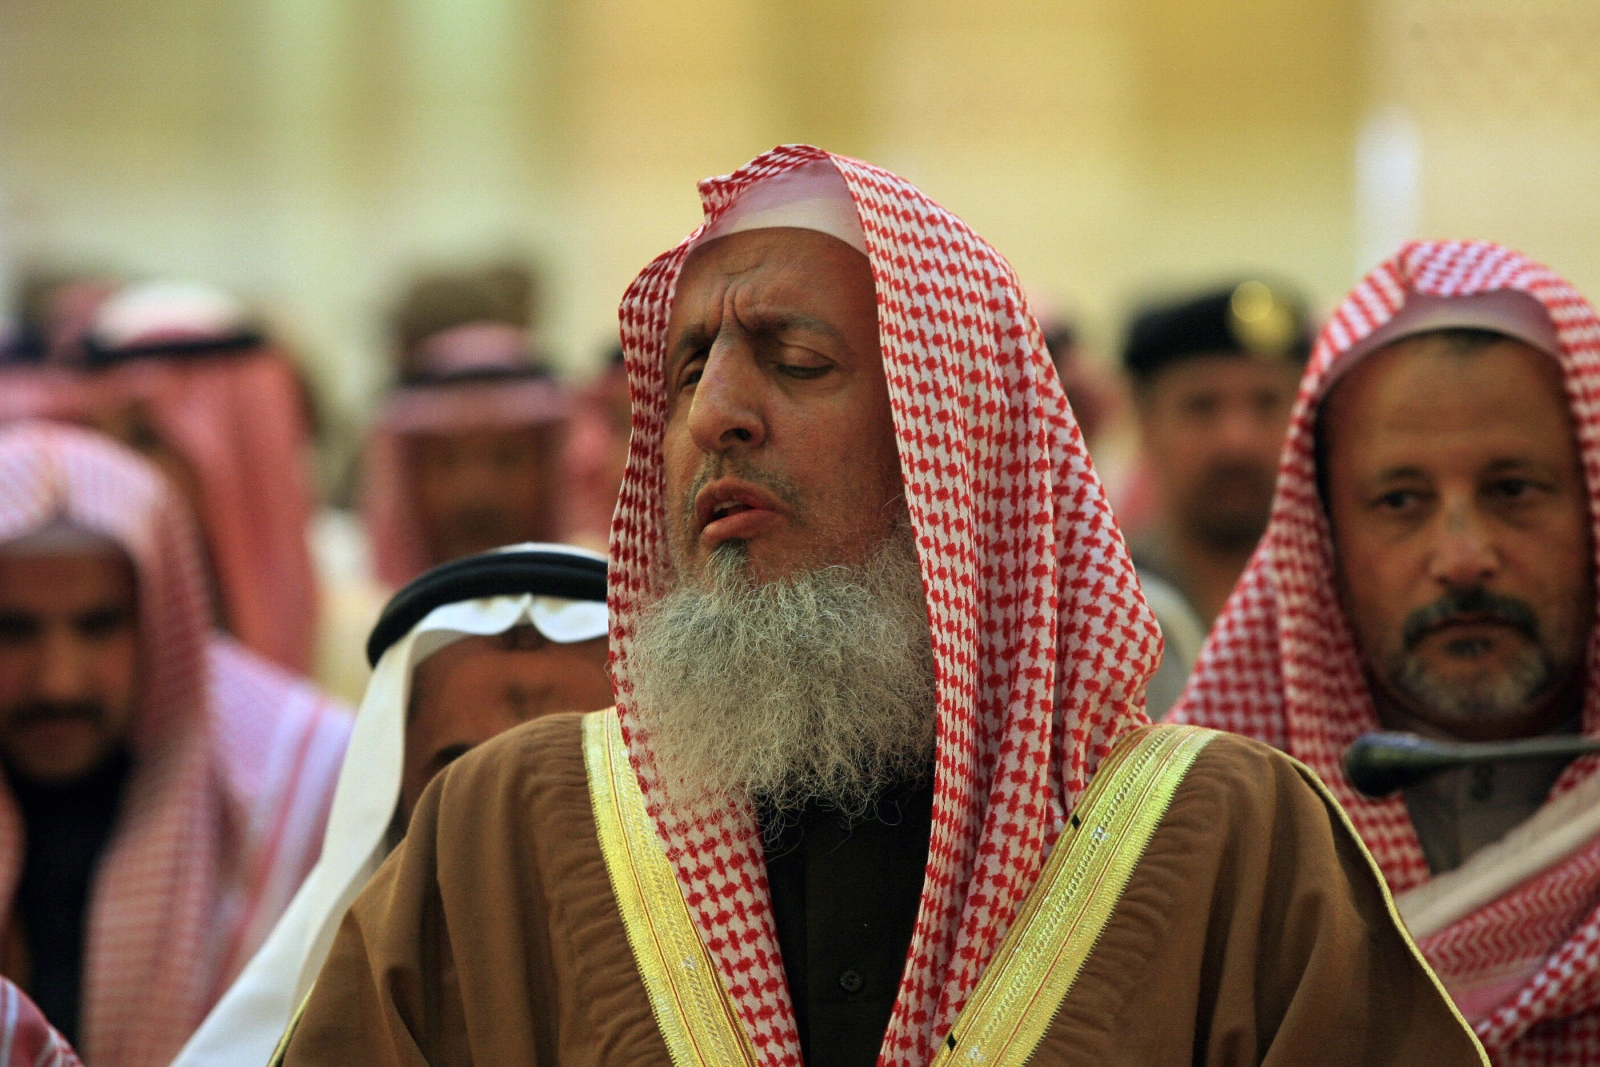 Sheikh Abdul Aziz al-Sheikh: Twitter is Source of All Evil and Devestation